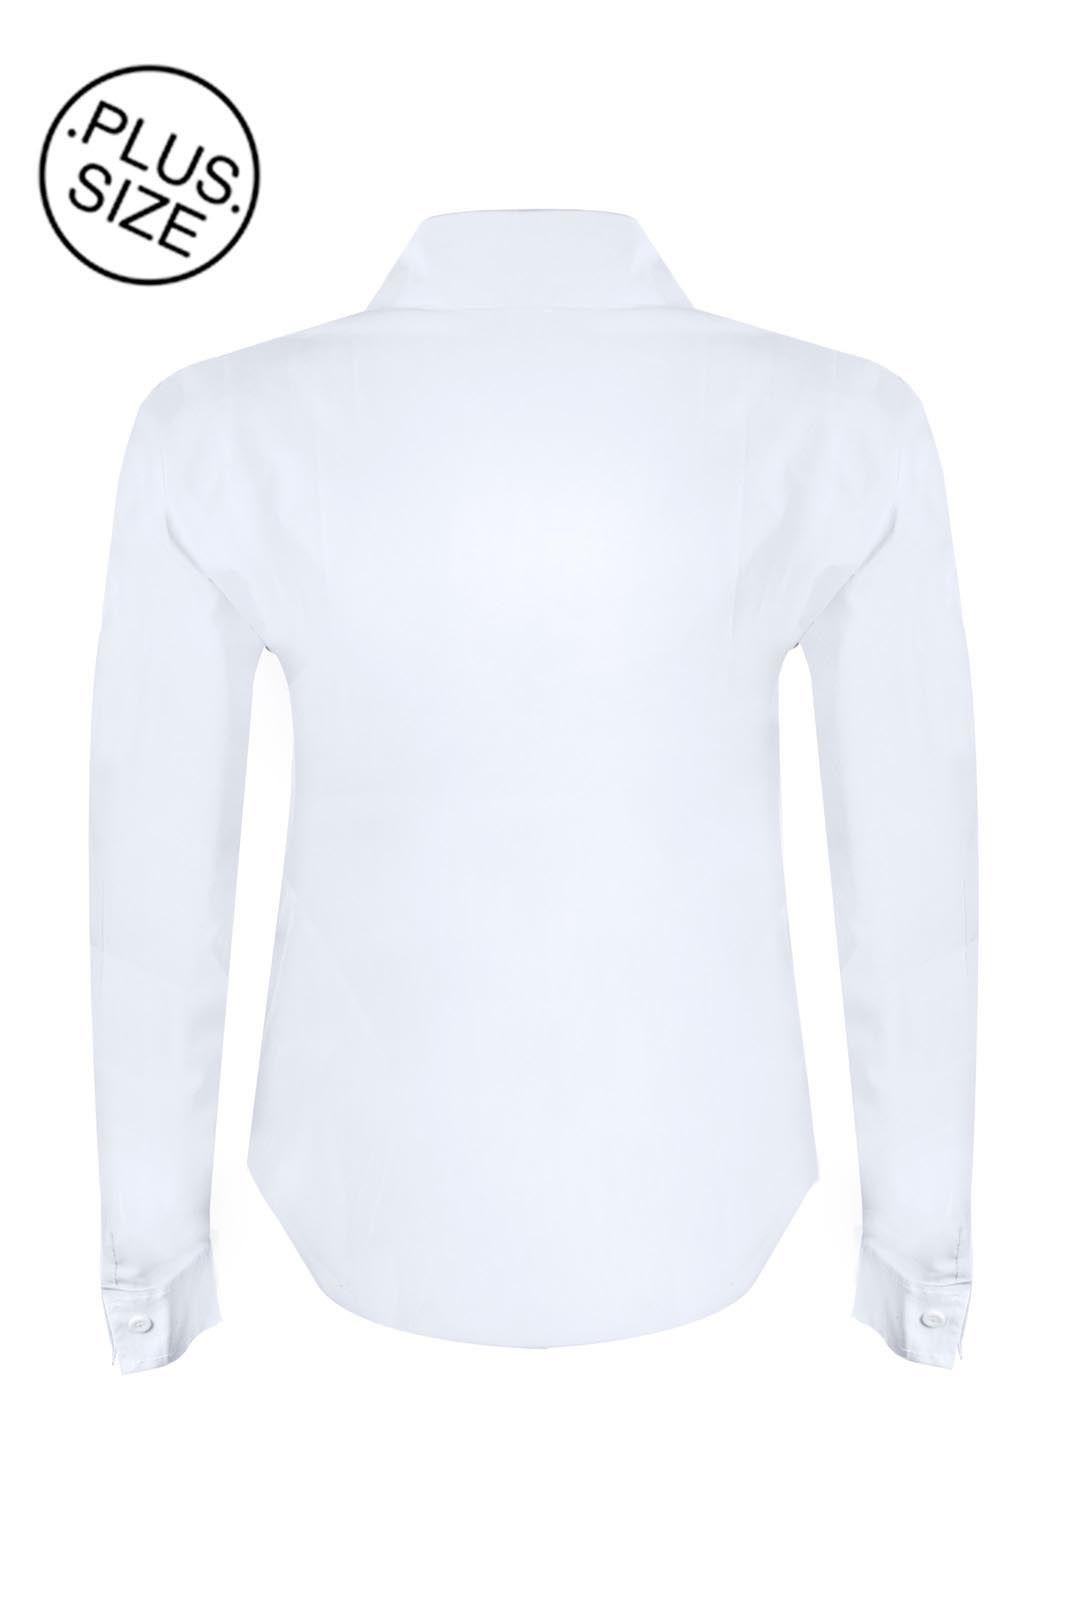 Camisete OutletDri Manga Longa Plus Size Branco